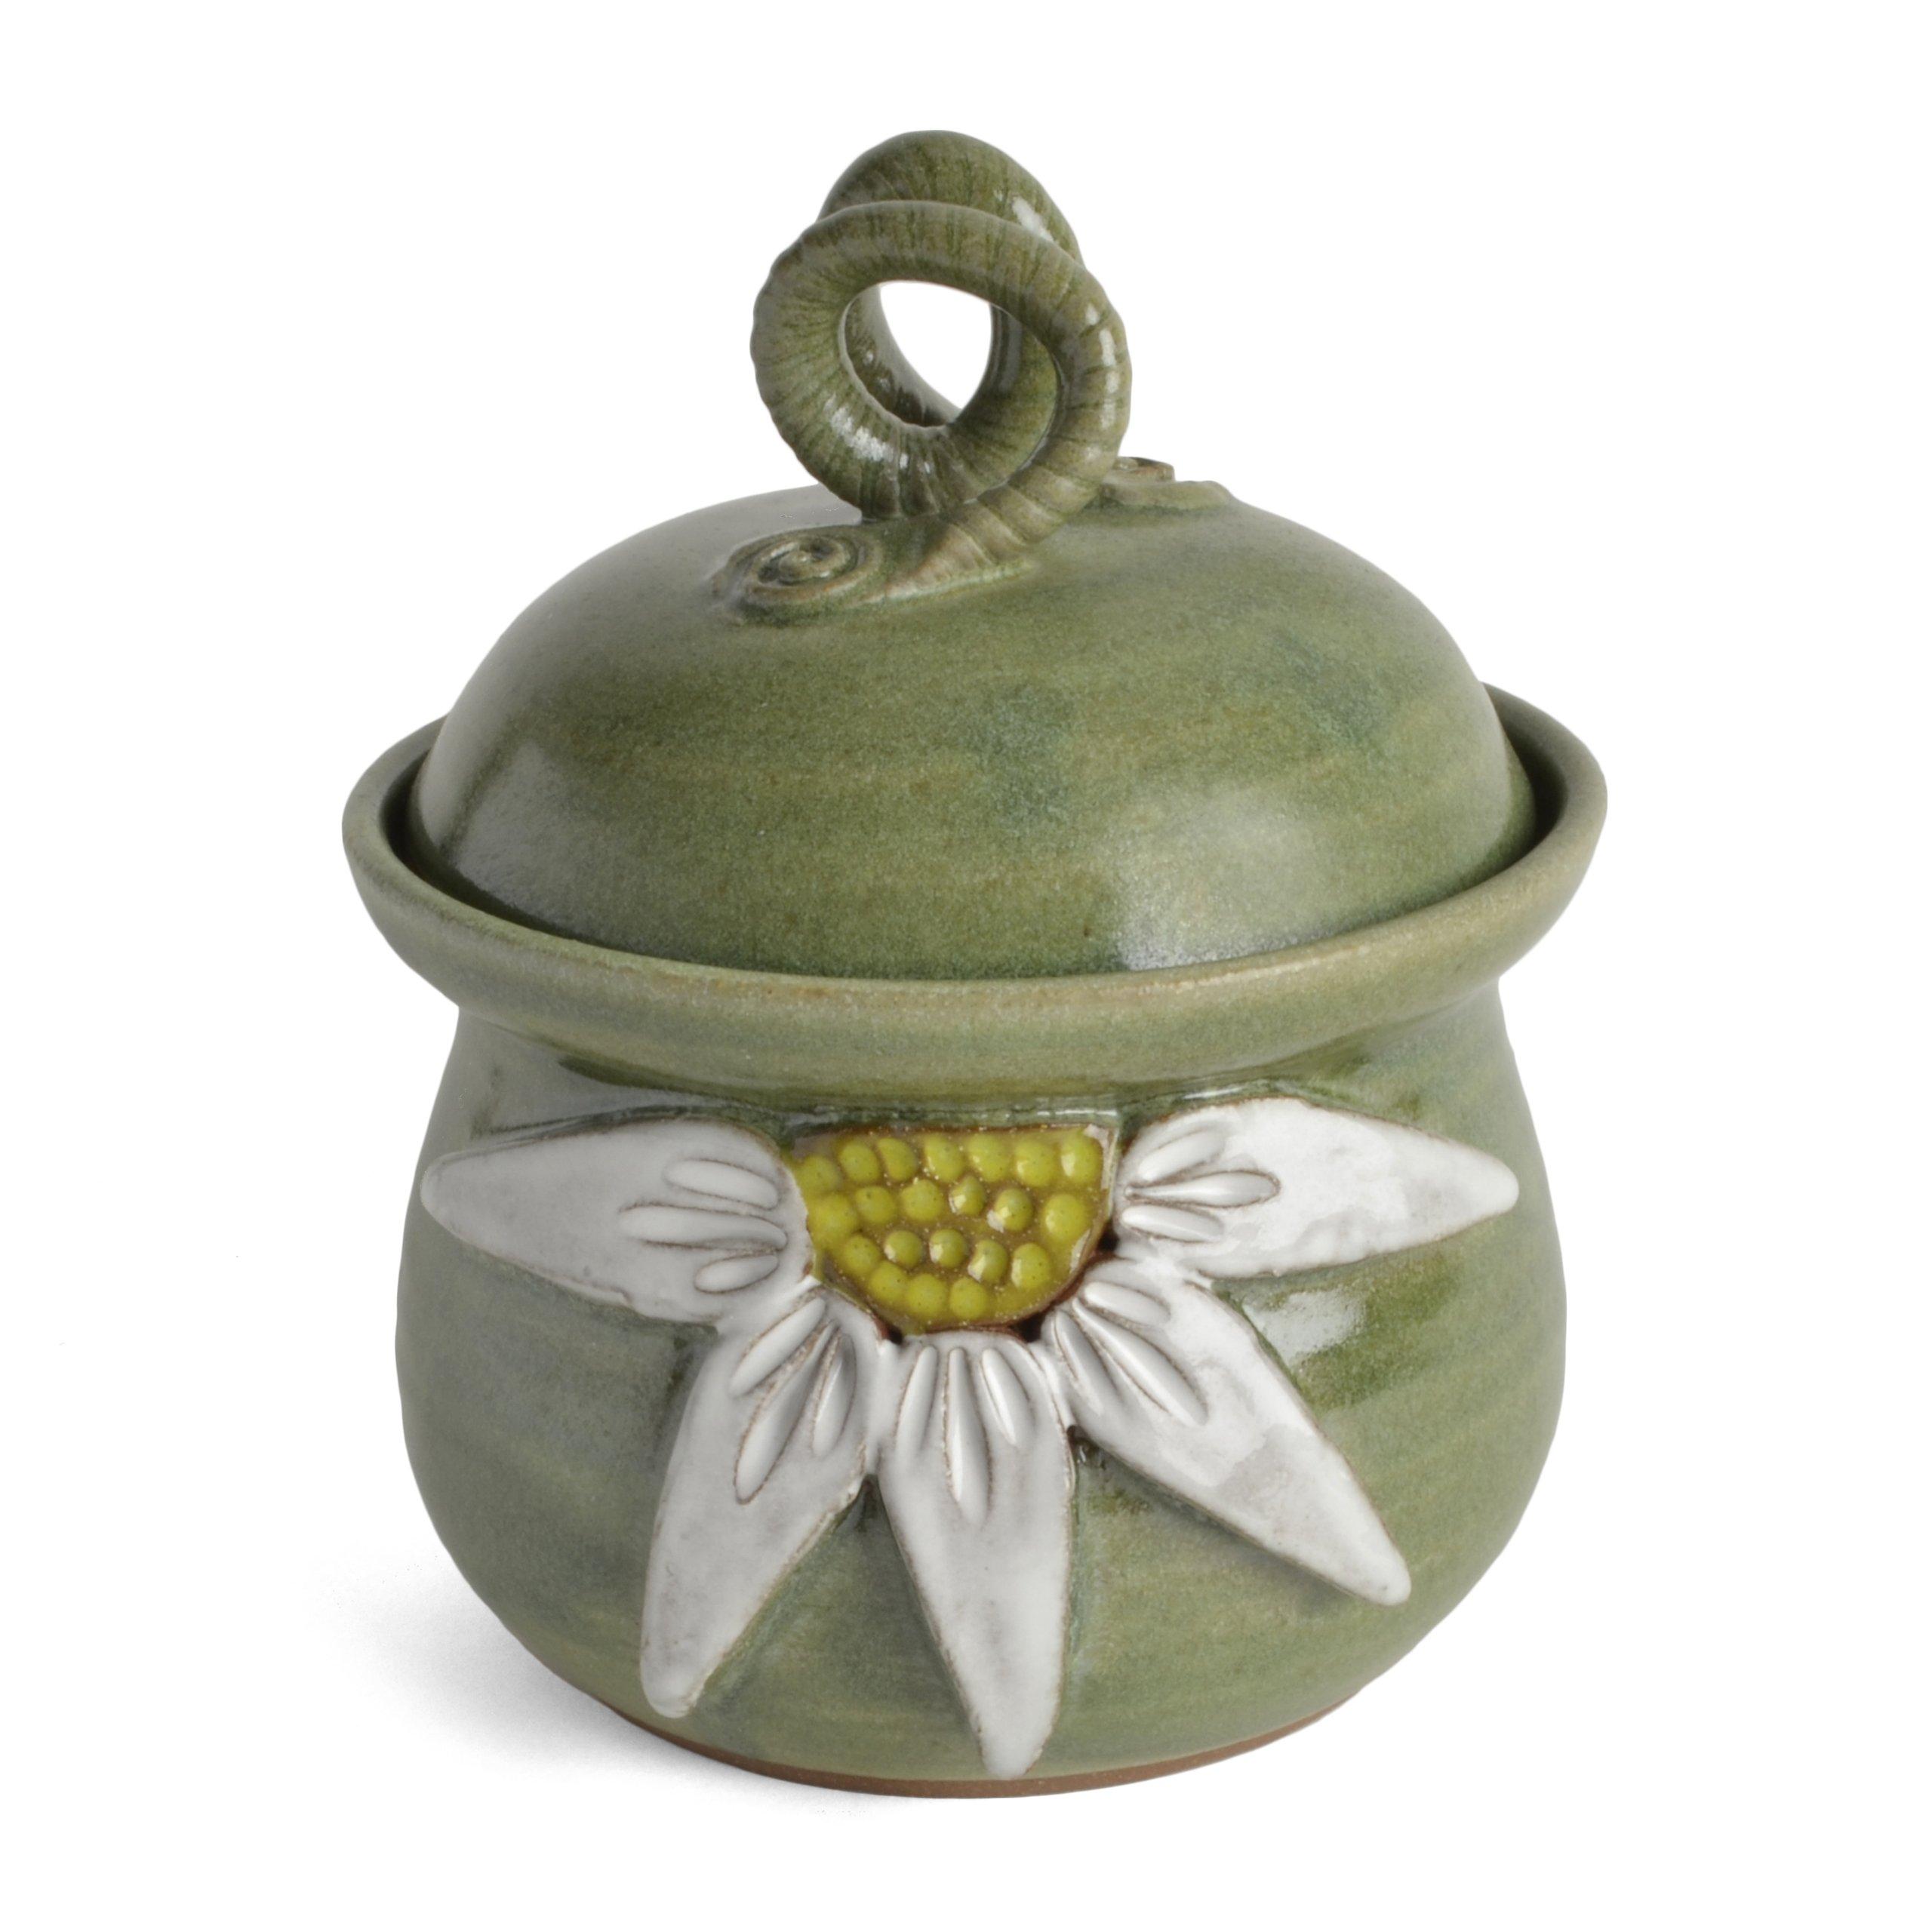 MudWorks Pottery Daisy Garlic Keeper by MudWorks Pottery